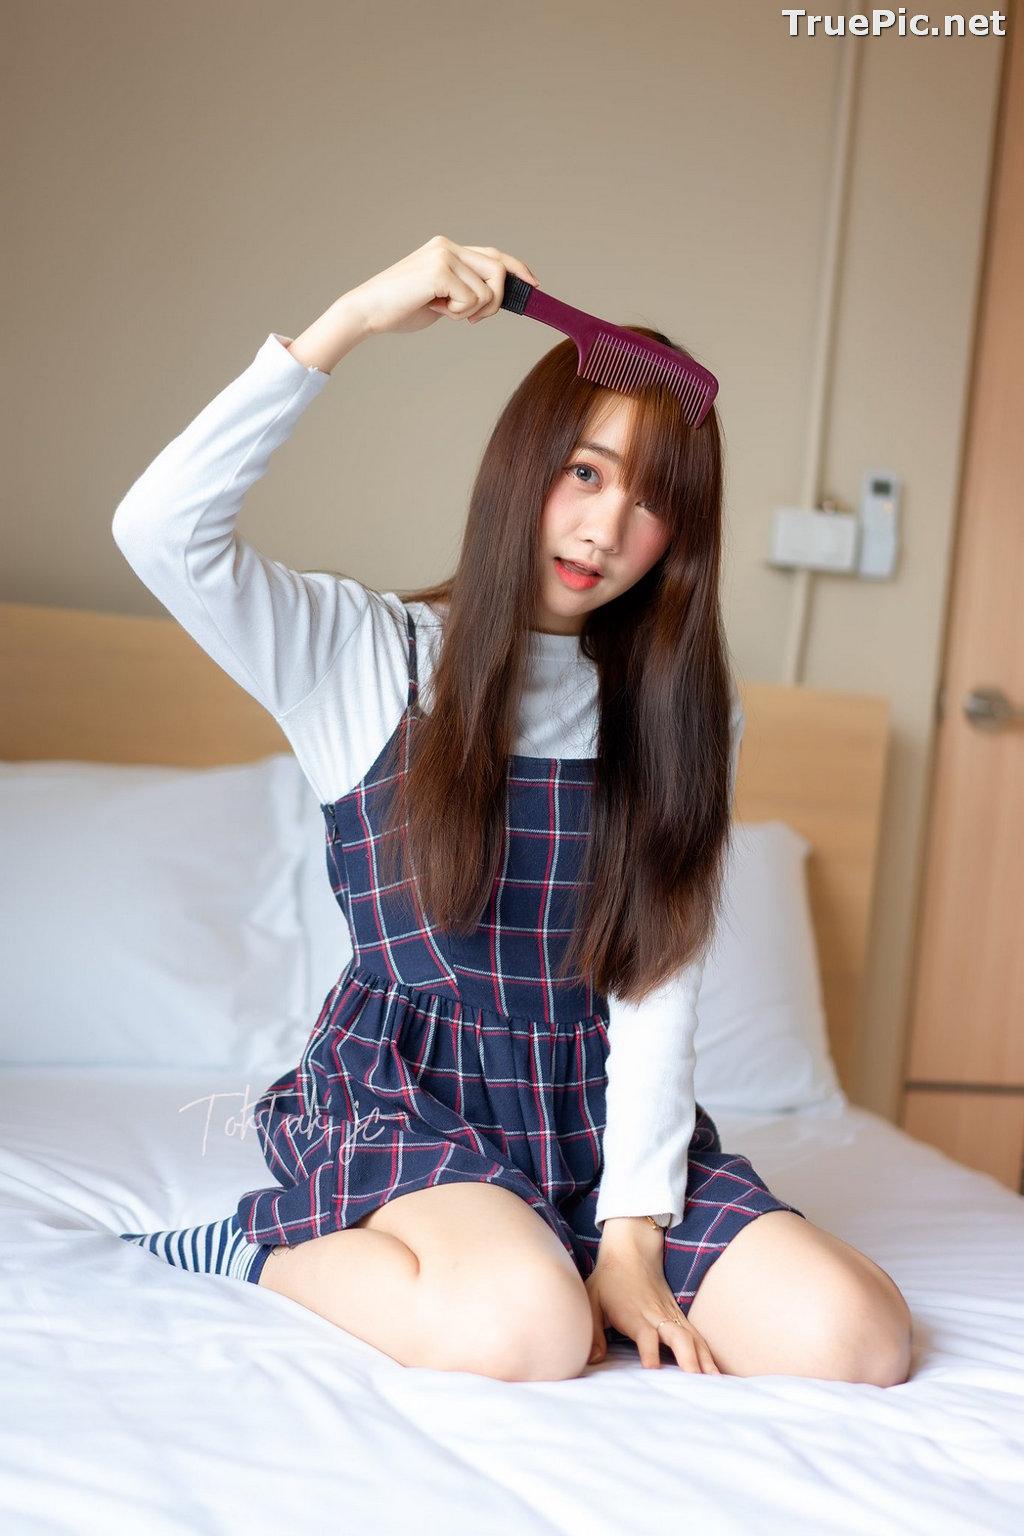 Image Thailand Model - Fenfern Aeryingsak - Cute School Girl - TruePic.net - Picture-3